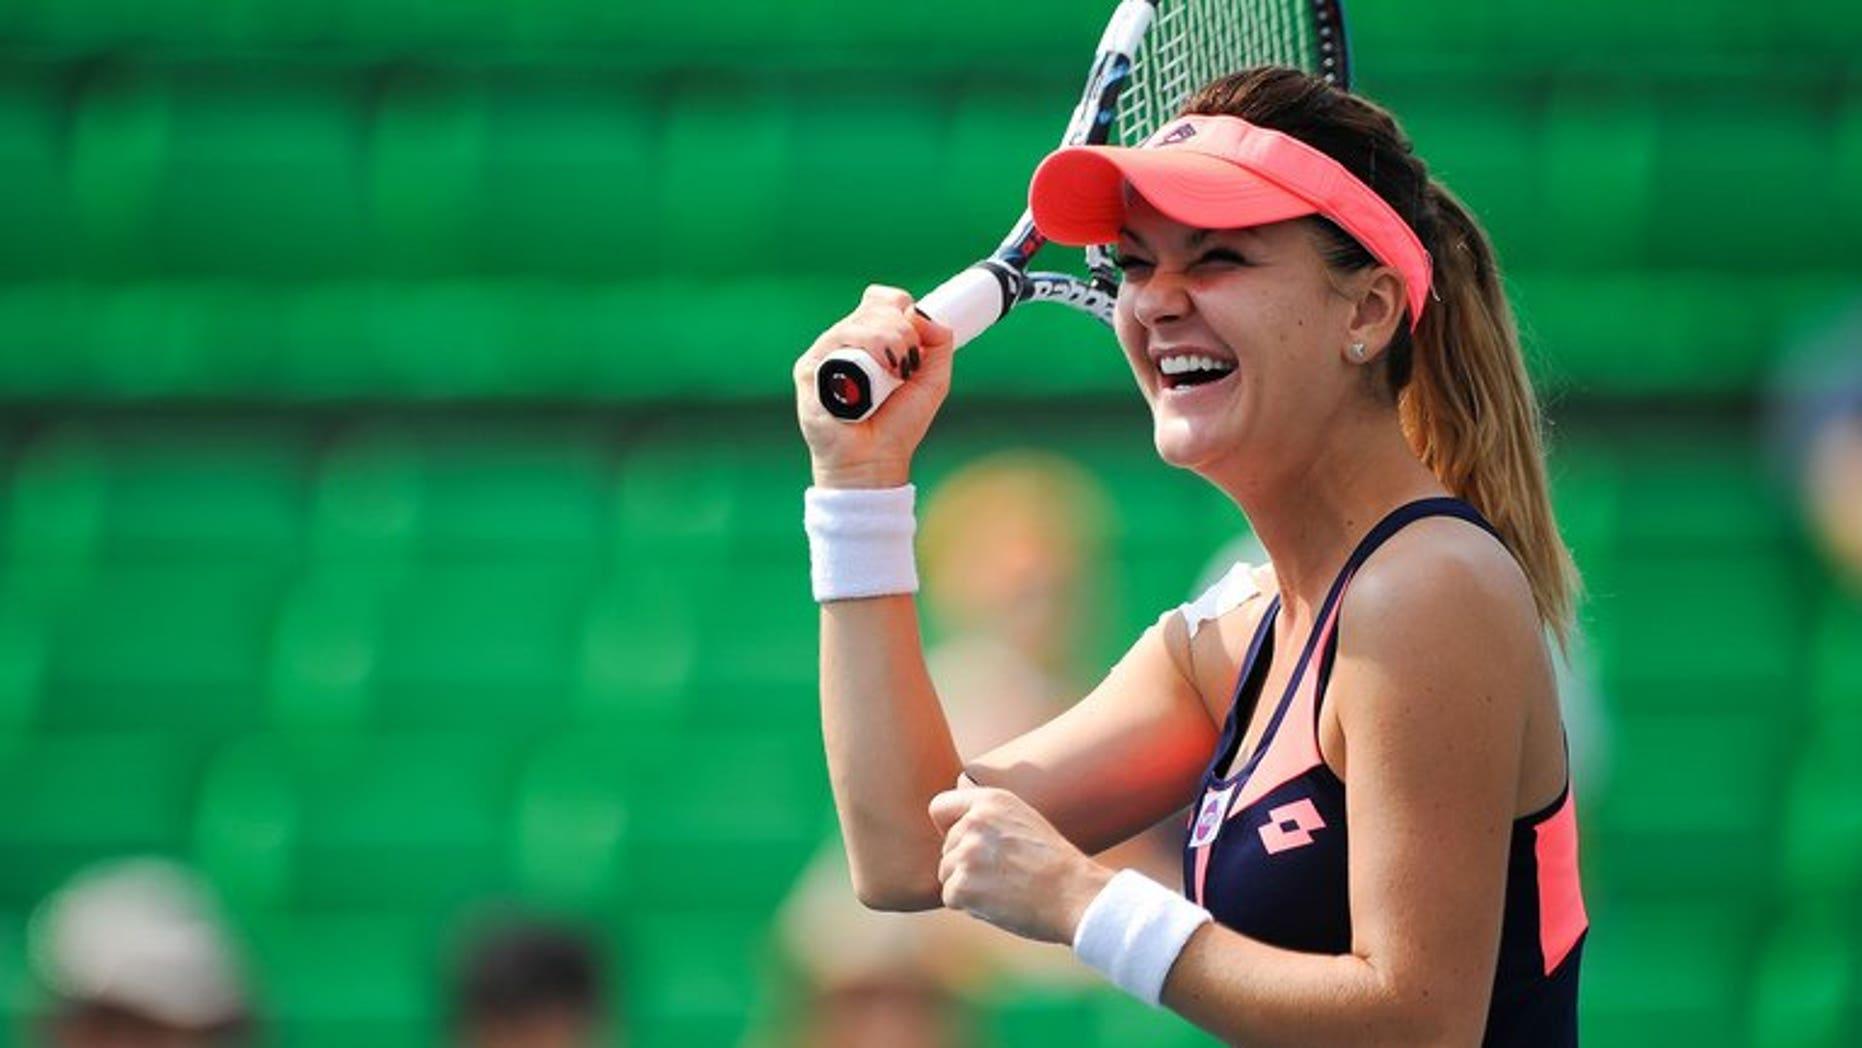 Agnieszka Radwanska of Poland at the 2013 WTA Korea Open tennis tournament in Seoul on September 21, 2013. Radwanska rallied from a set down to win the Korea Open at her first attempt on Sunday, edging out Russian Anastasia Pavlyuchenkova 6-7 (6/8), 6-3, 6-4.